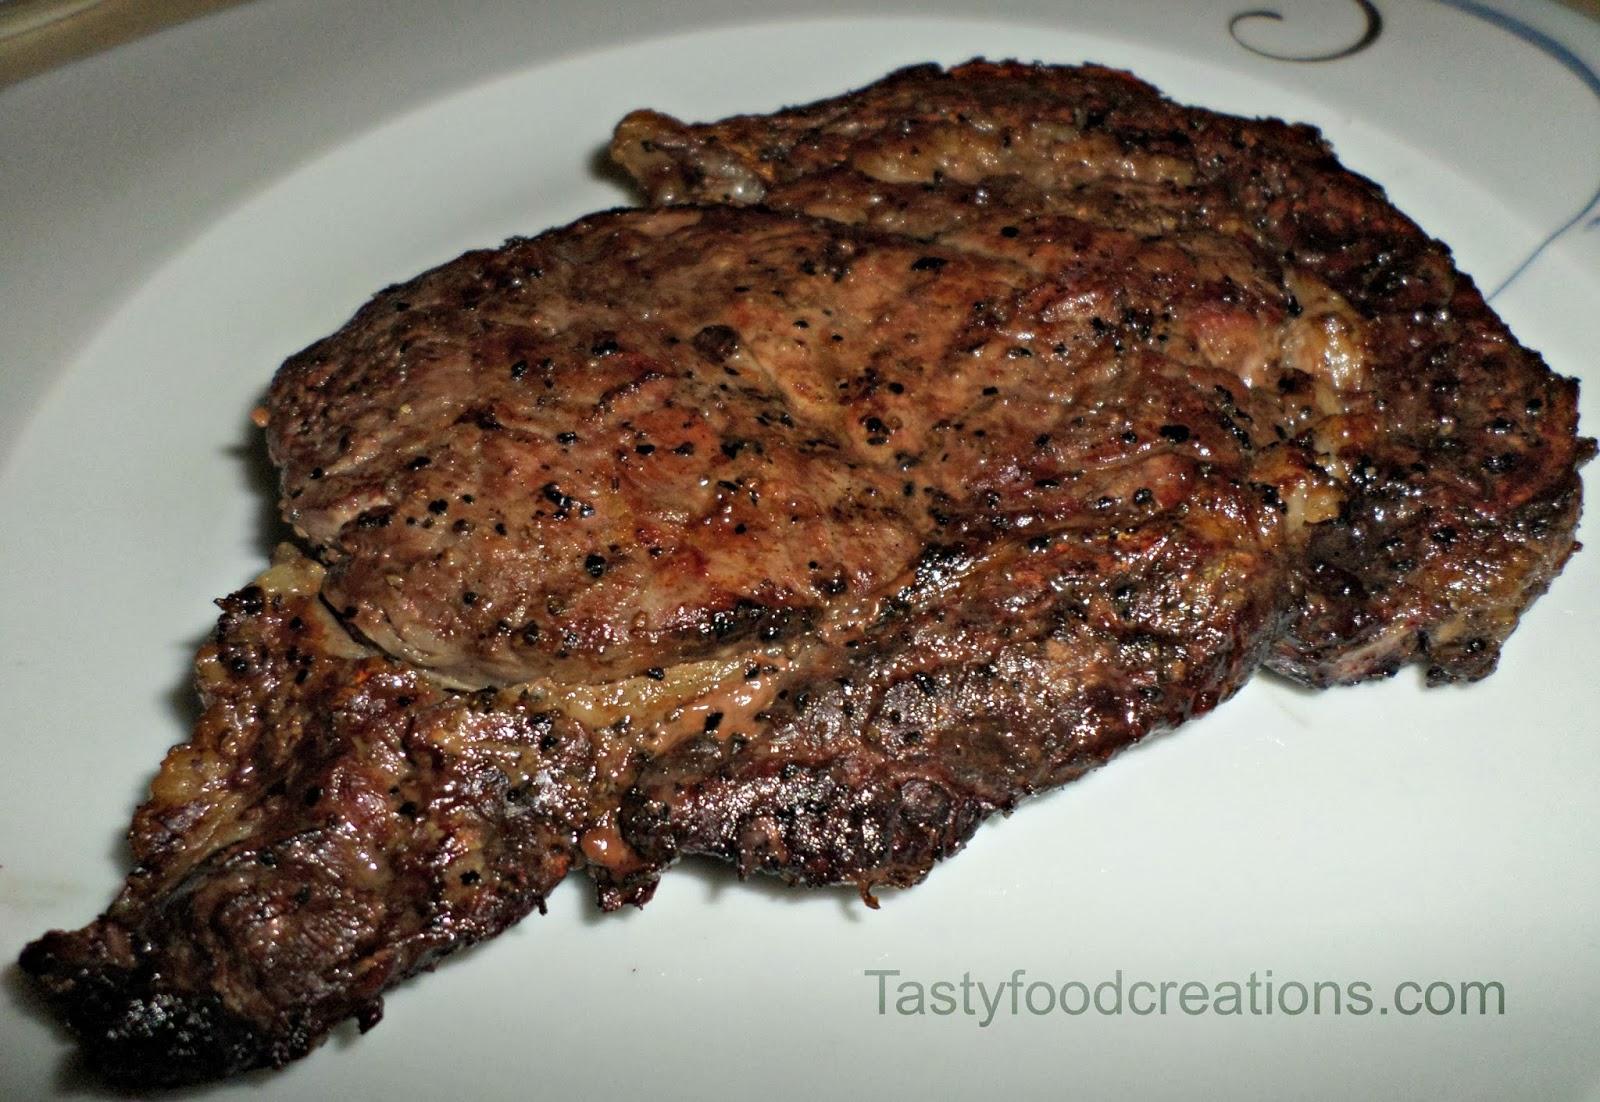 Tasty Food Creations: Grilled Rib Eye Steak